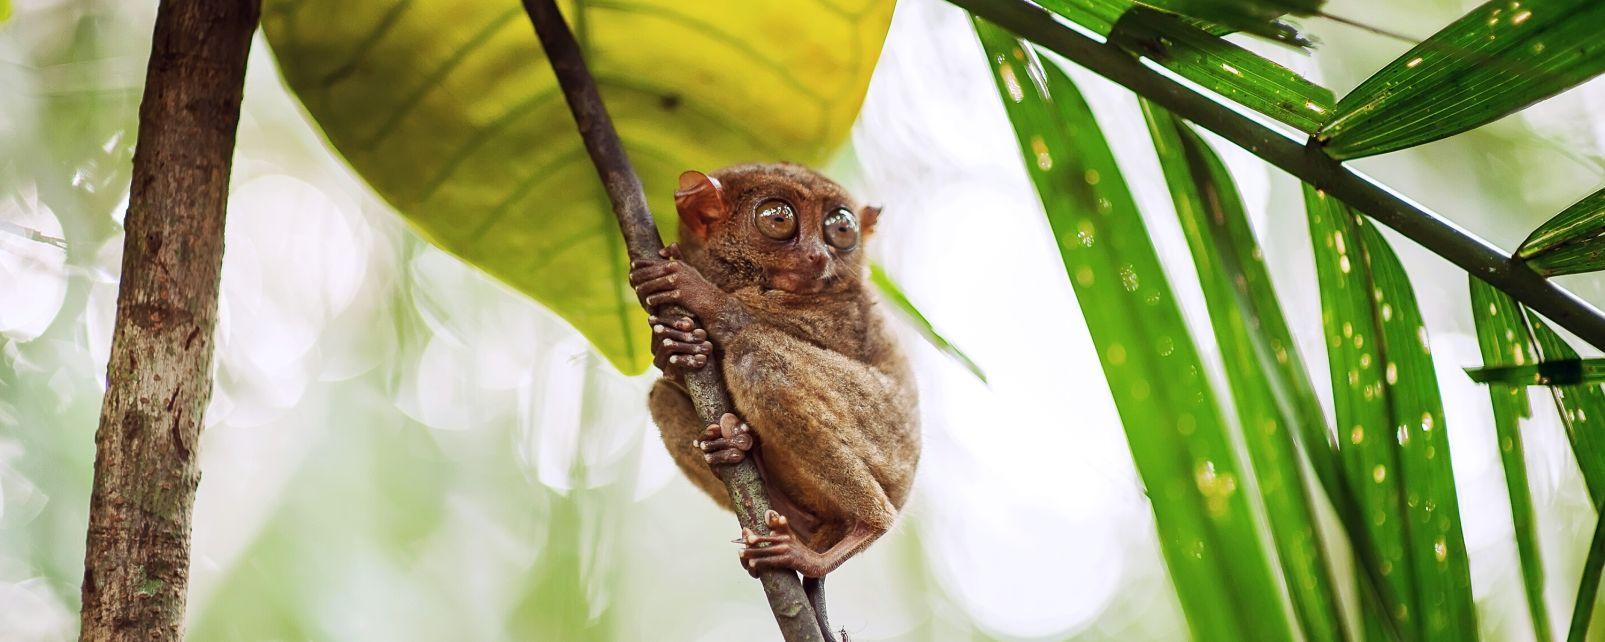 La faune et la flore, tarsier, primate, animal, faune, mammifère, asie, philippines, foret, Sarangani, mindanao